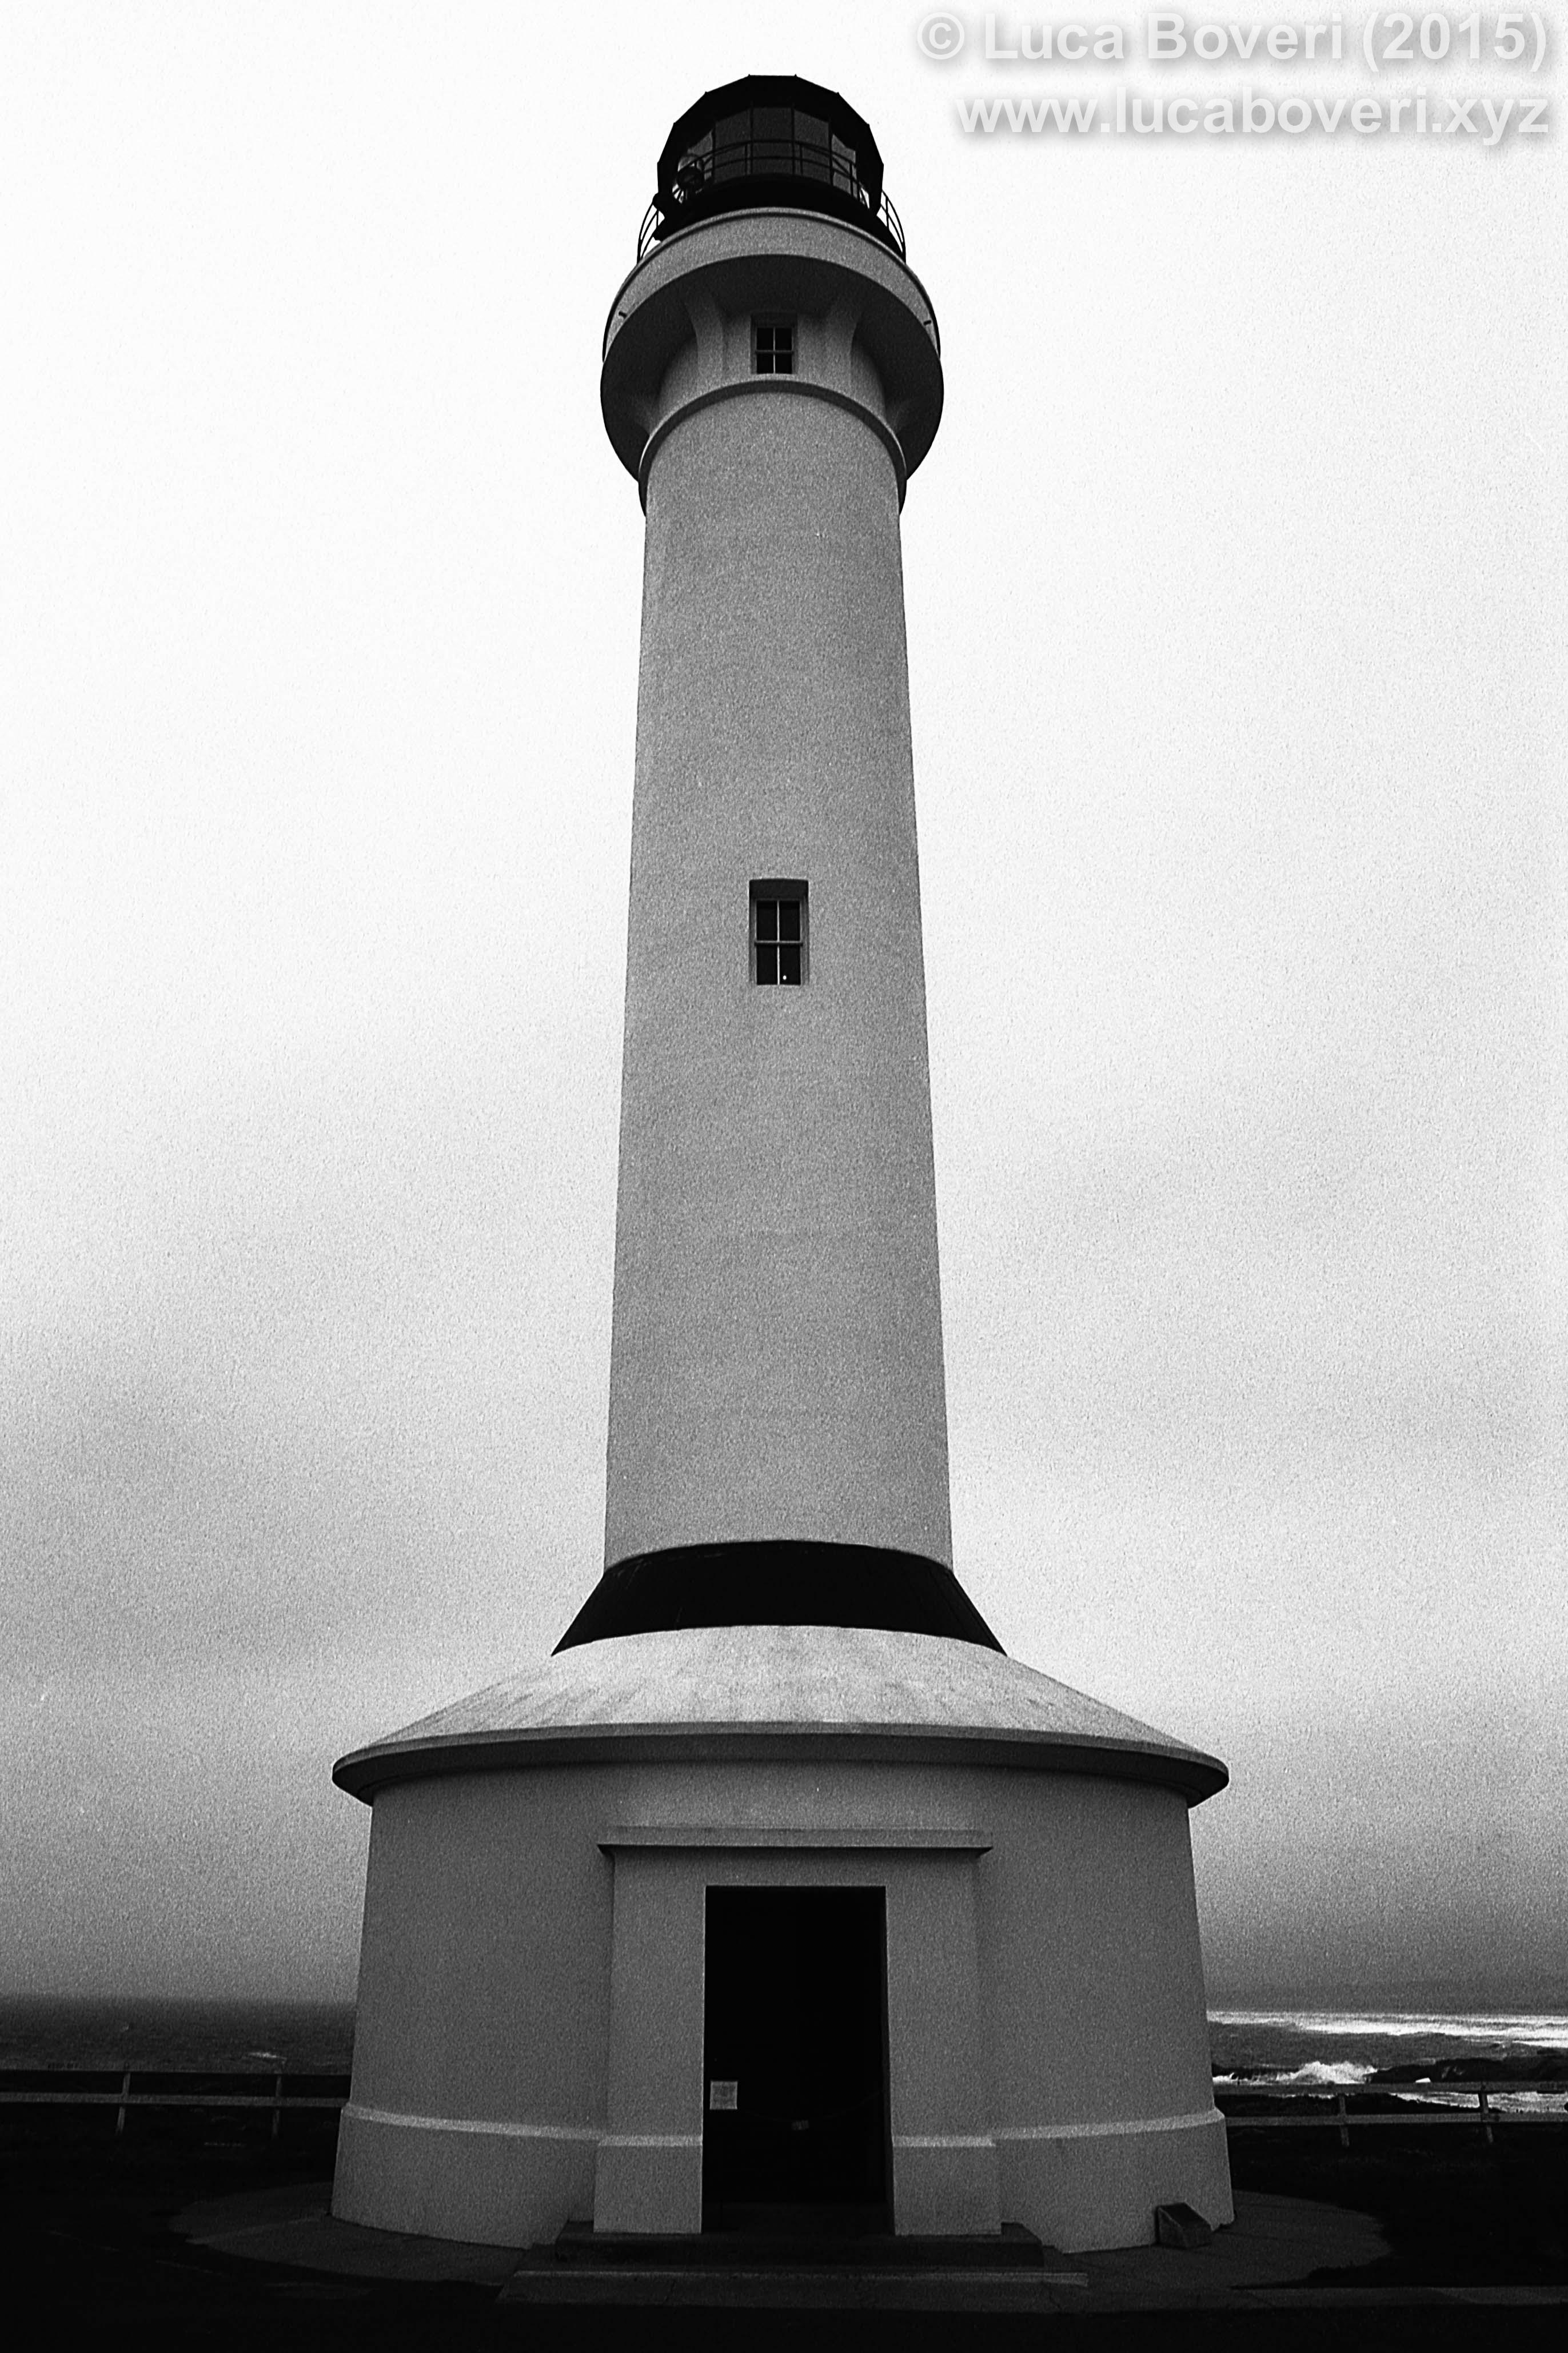 Mendocino lighthouse @lucaboveri